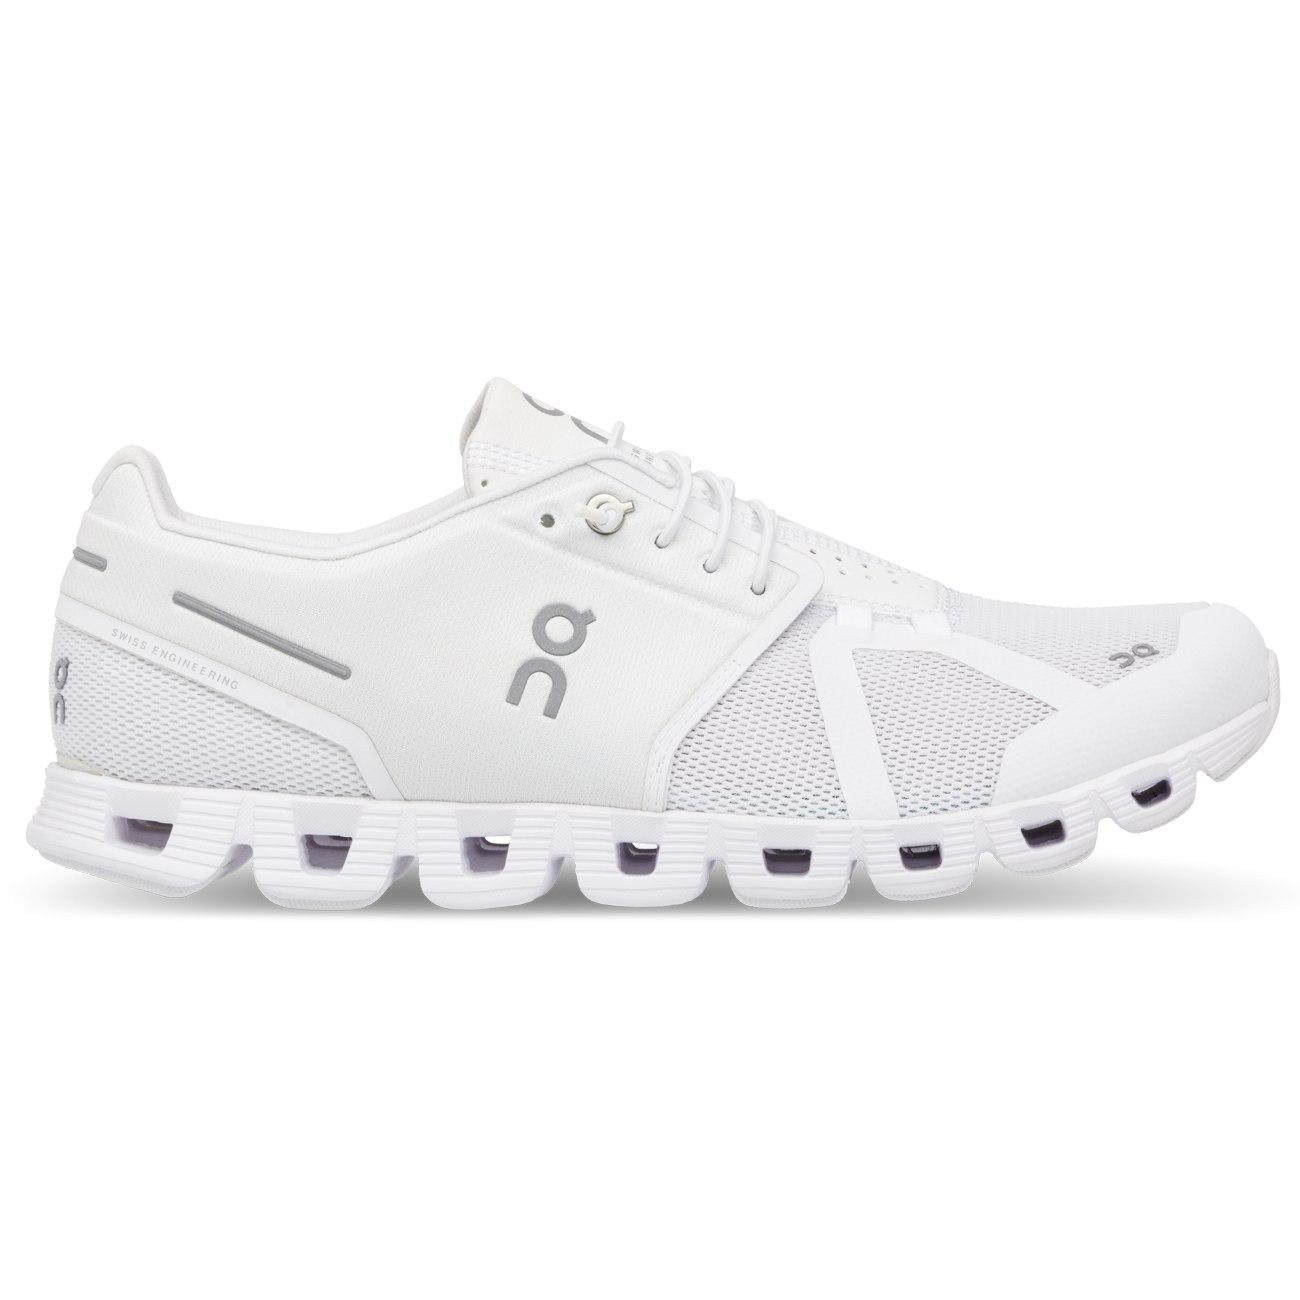 On Cloud Zapatillas Running Mujer - all blanco